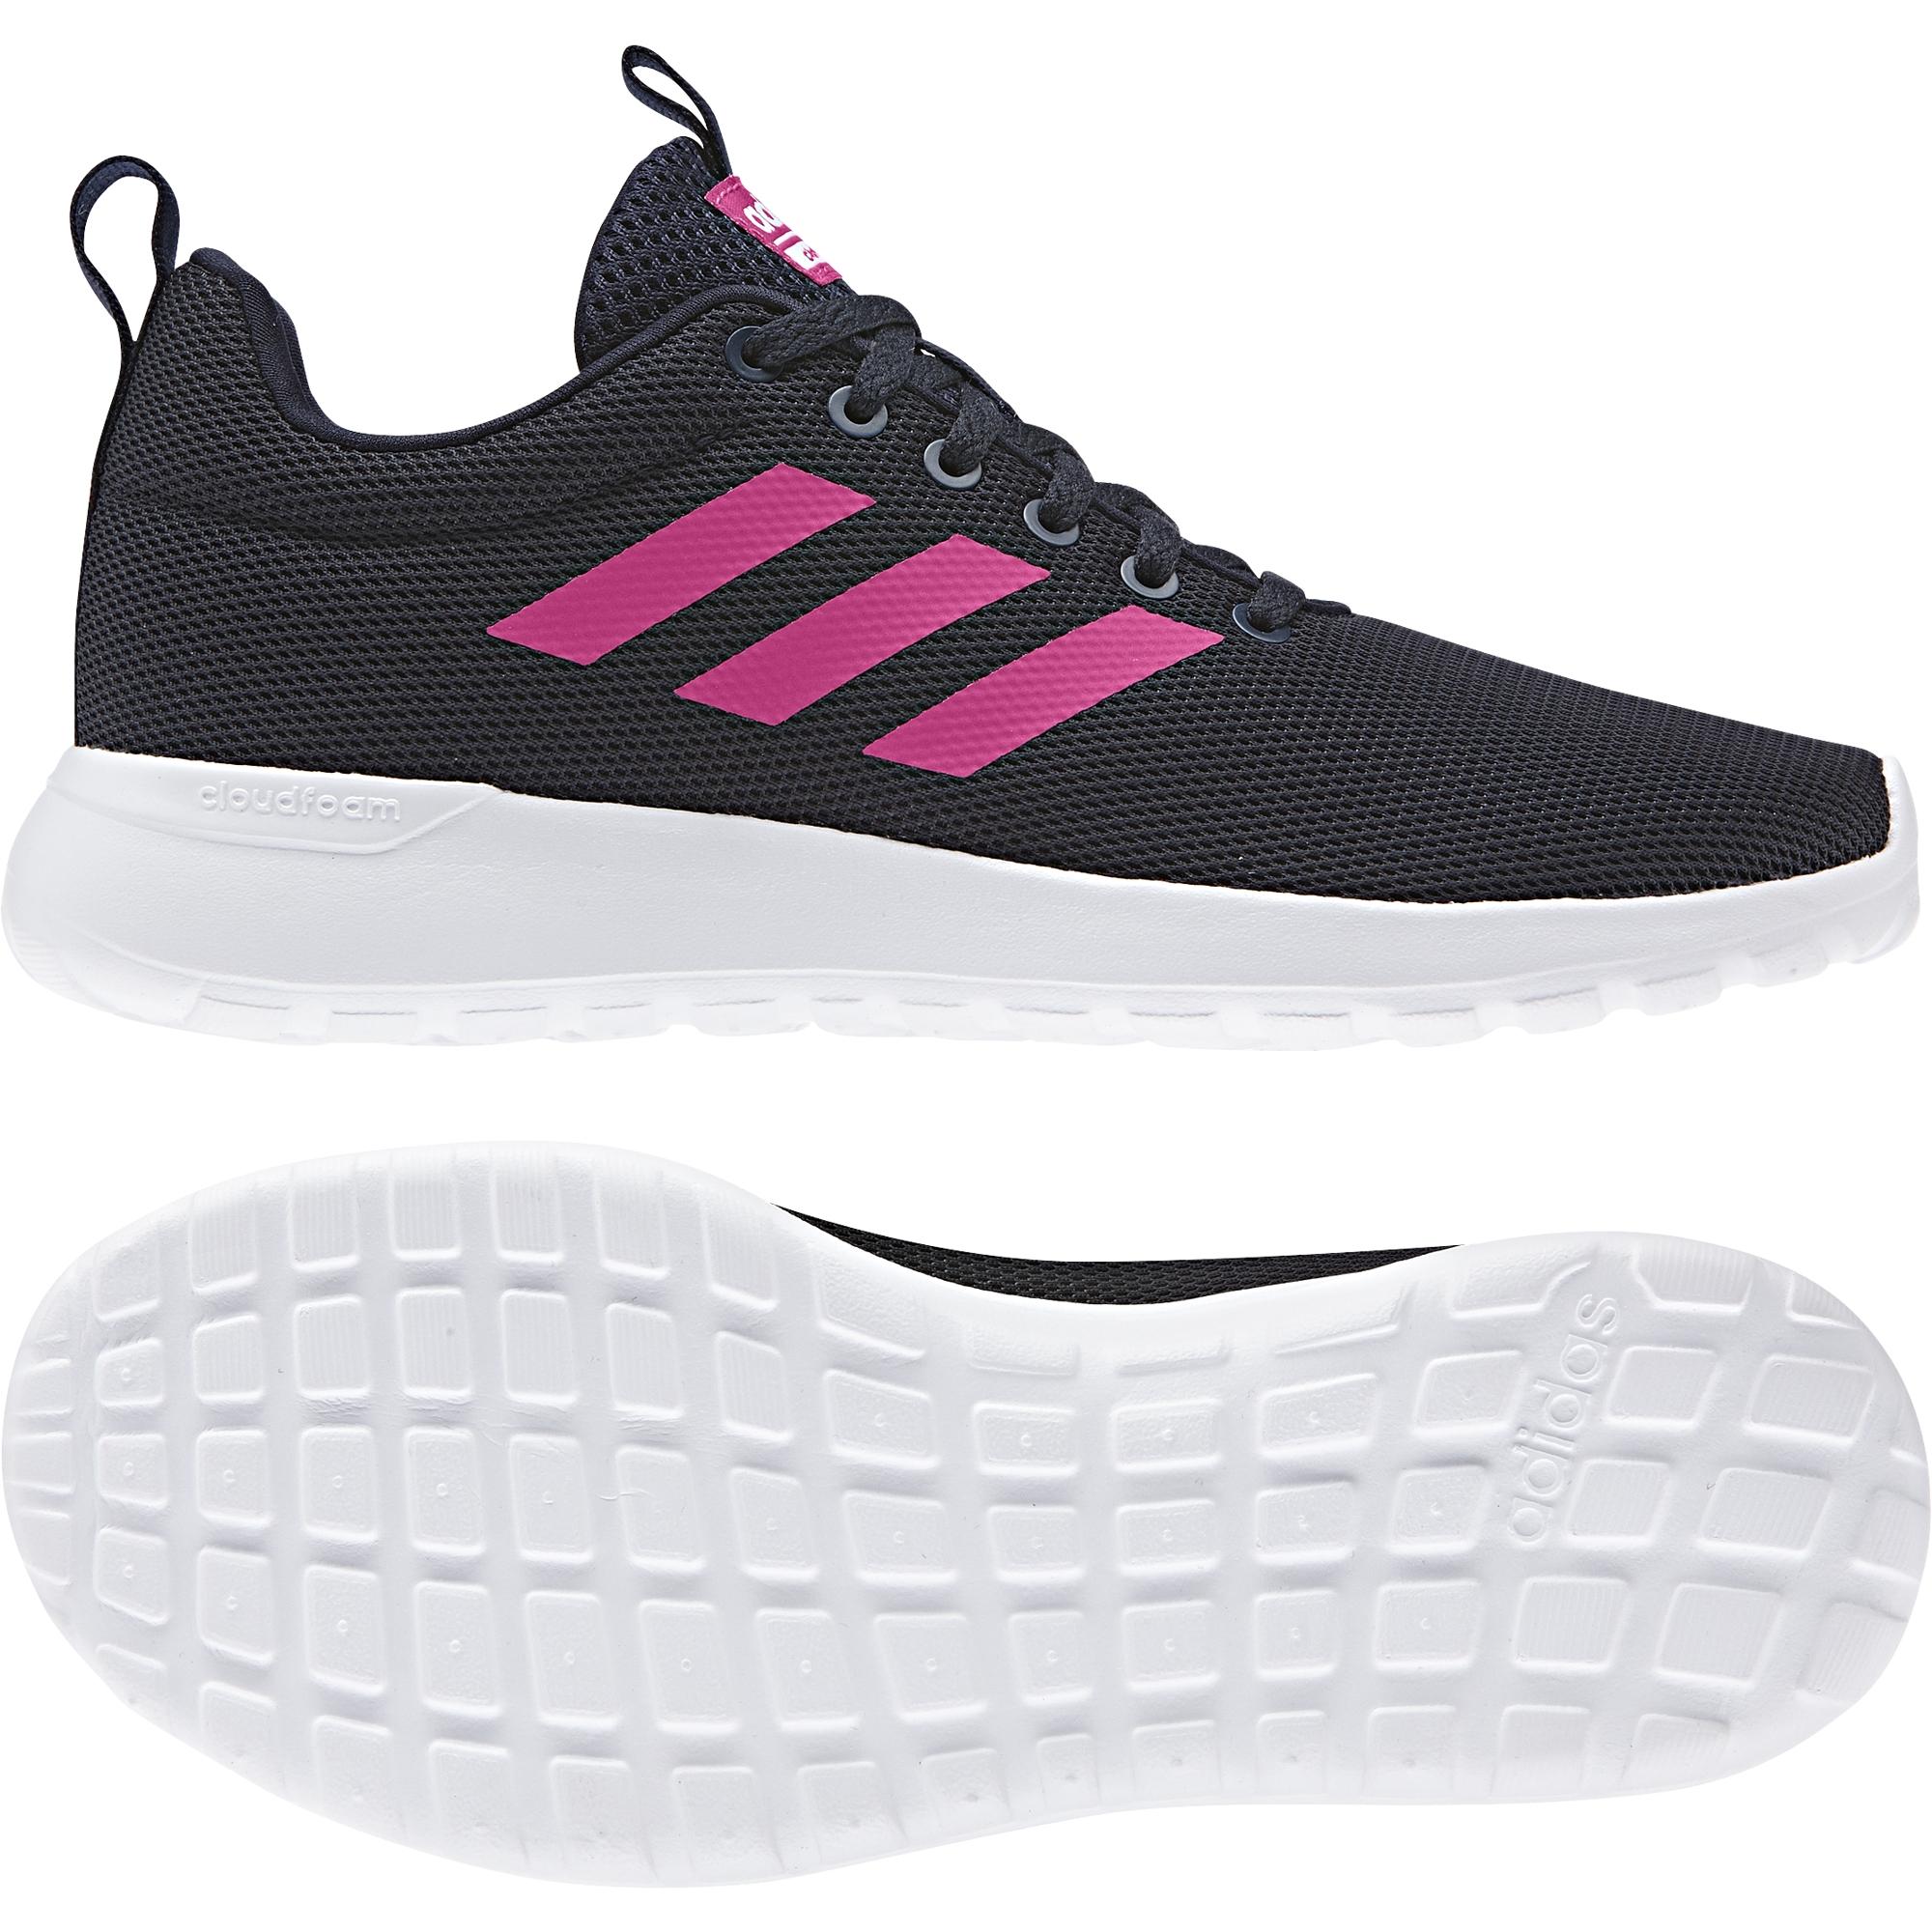 Chaussures femme adidas Lite Racer CLN